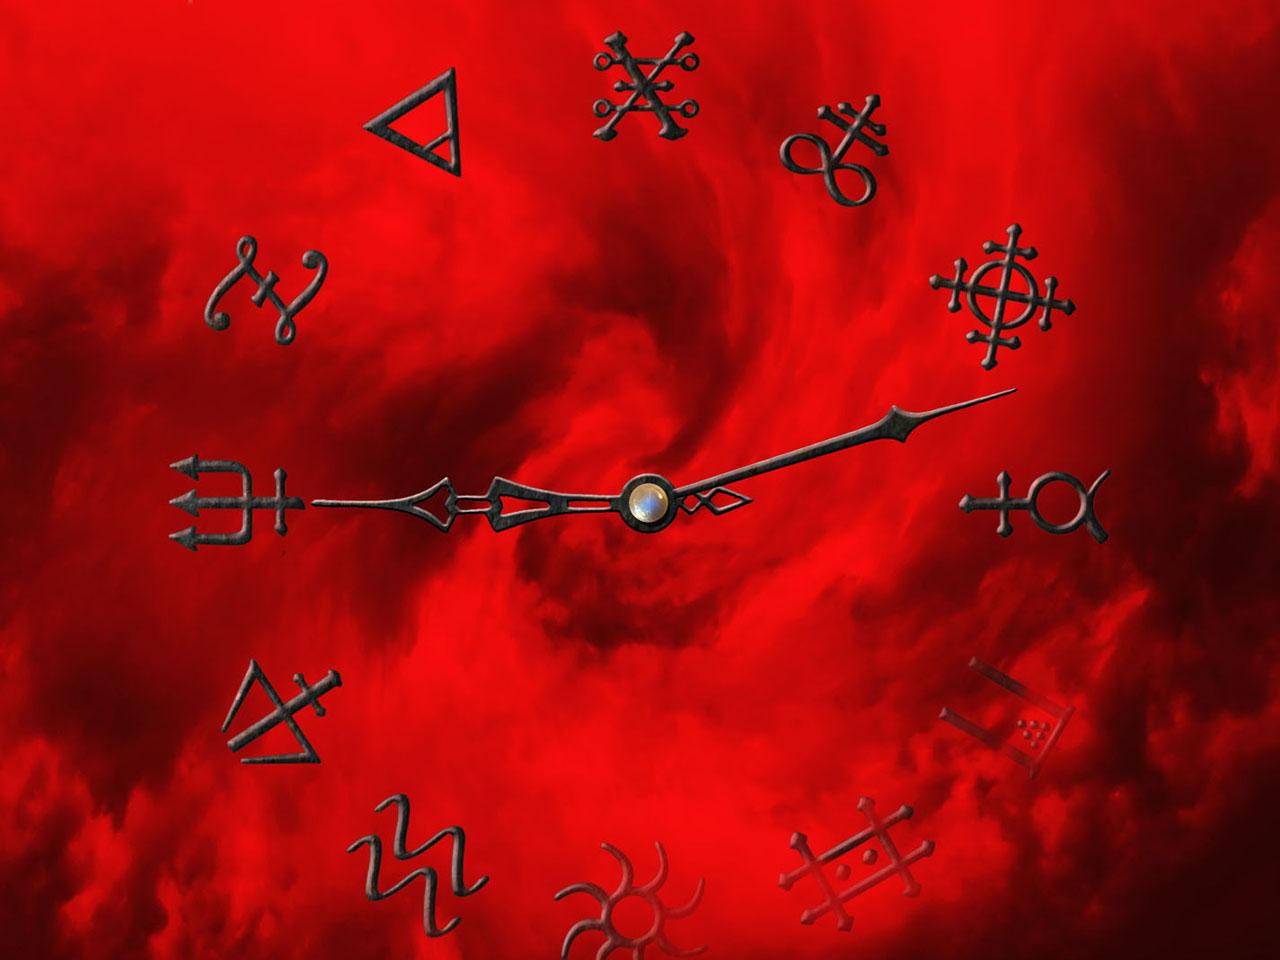 Tribute To RUSH Clockwork Angels   Desktop and Smartphone Wallpaper 1280x960